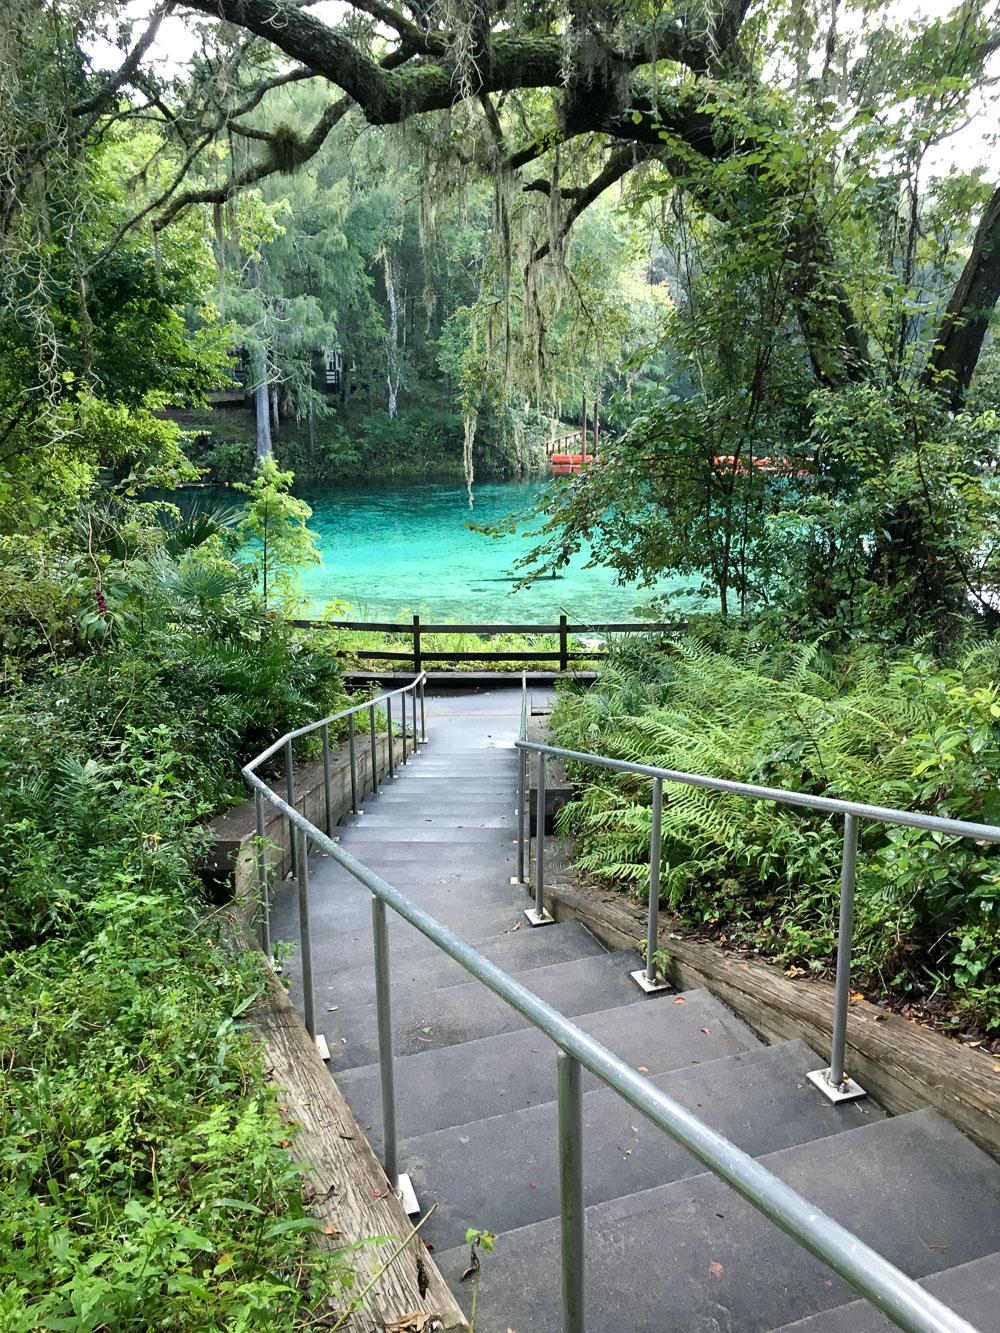 What To Do In & Around Ocala, FL